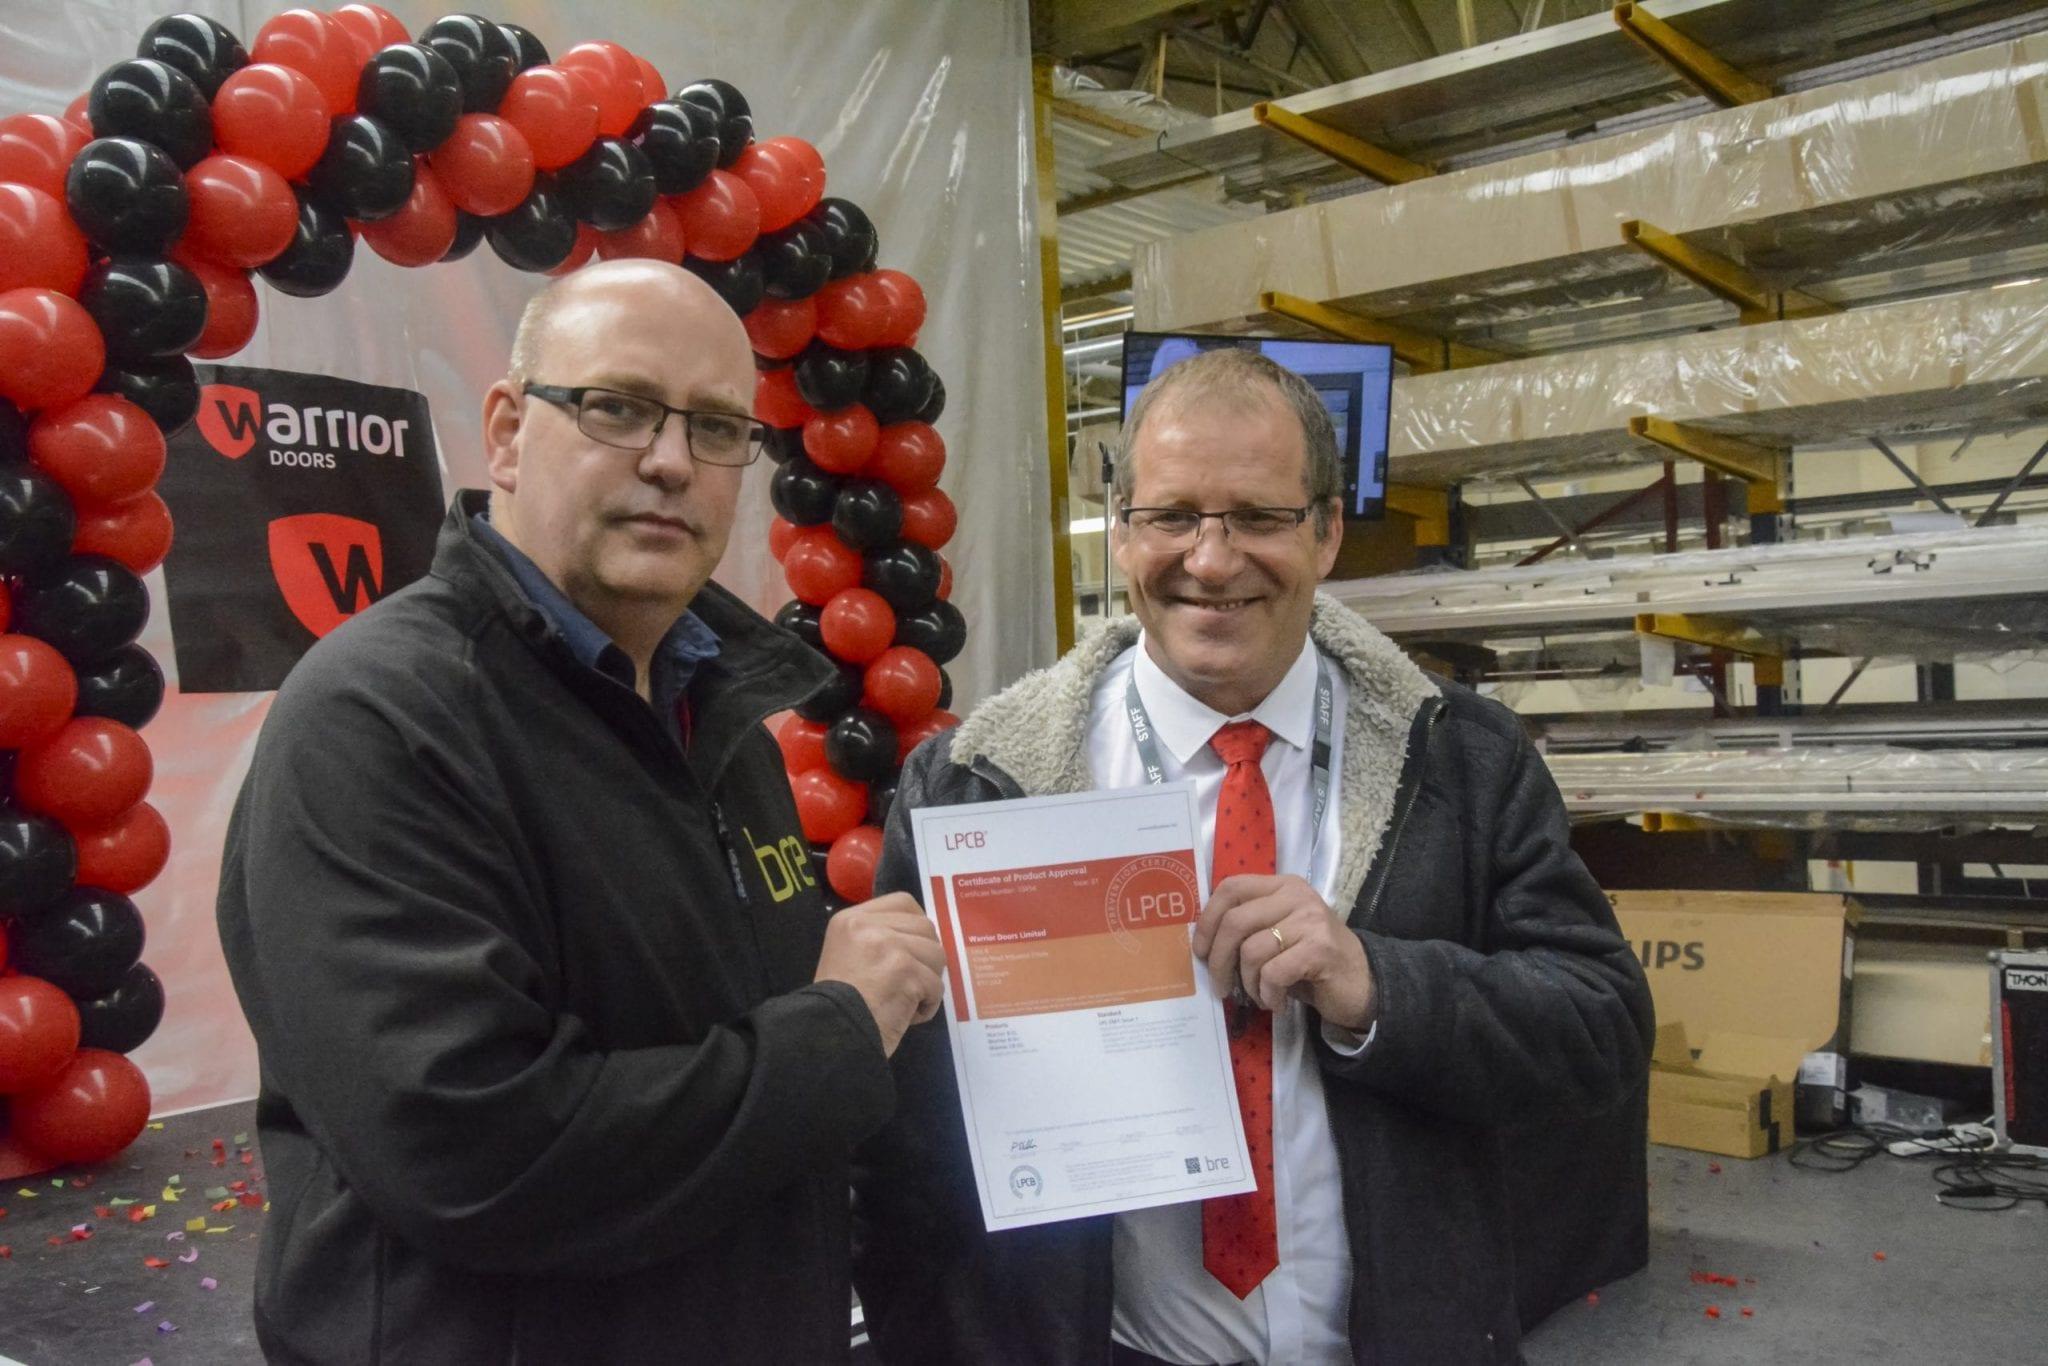 BRE and Managing Director Brett Barratt holding the certificate for LPS 2081 SRB.